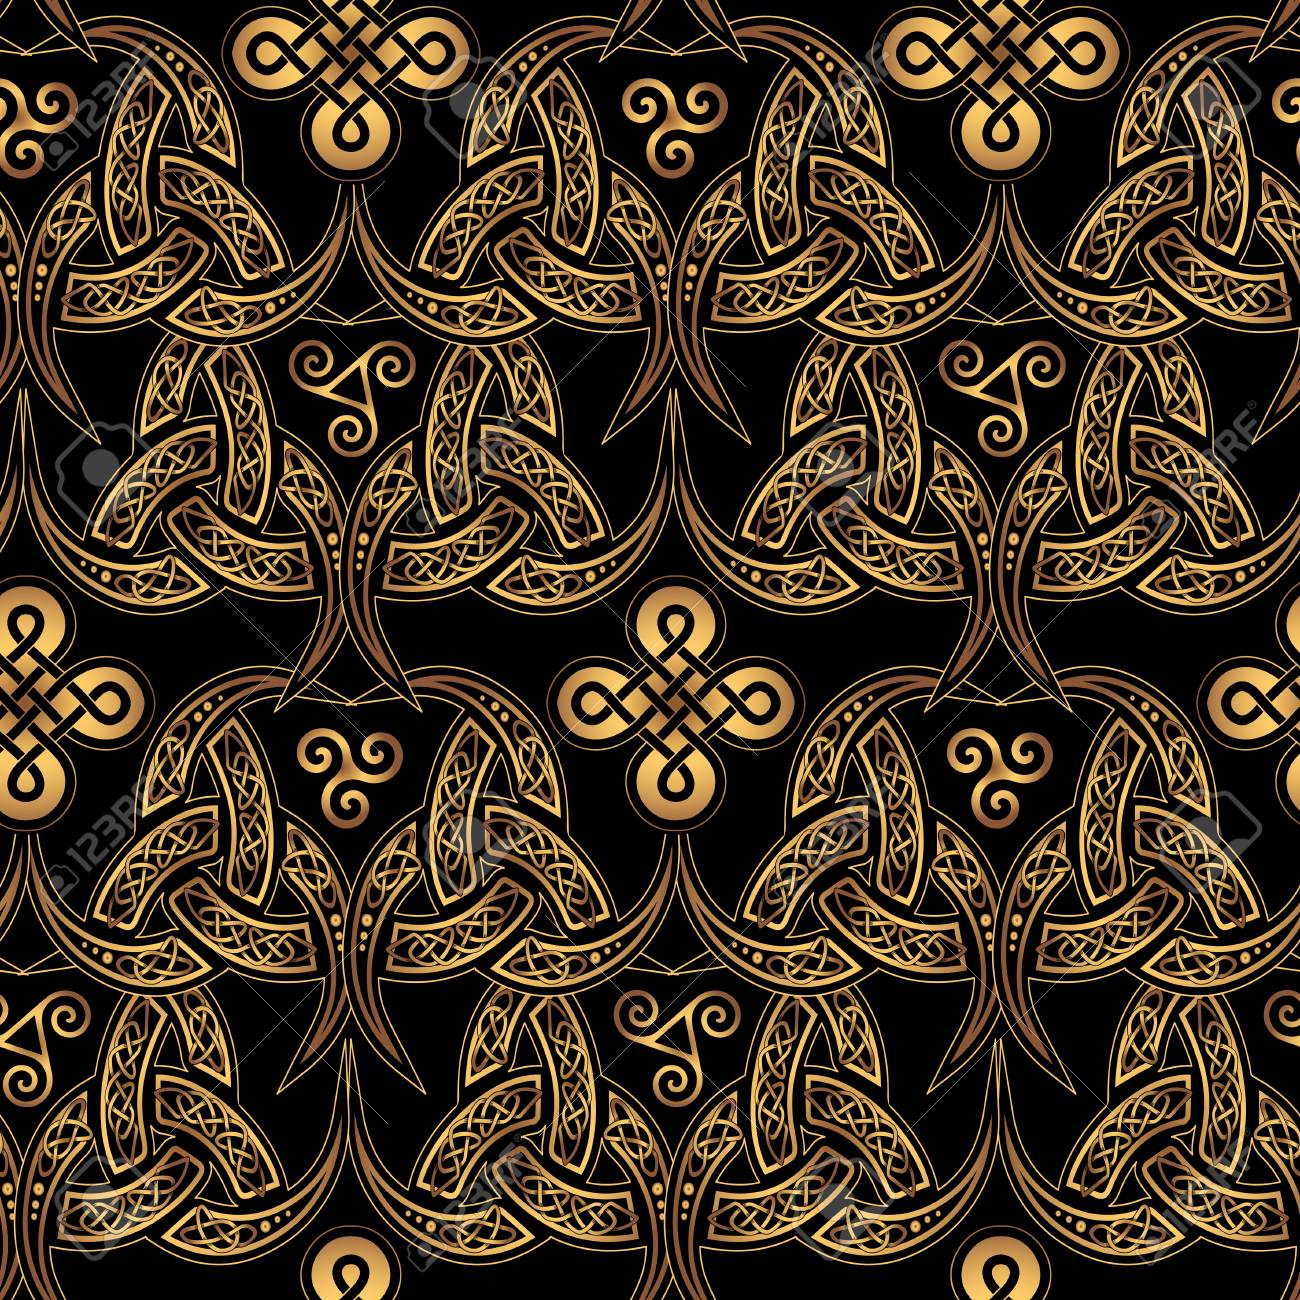 Scandinavian Celtic Seamless Wallpaper Elegant Golden Ethnic Patterns Of Druids On A Black Background Stock